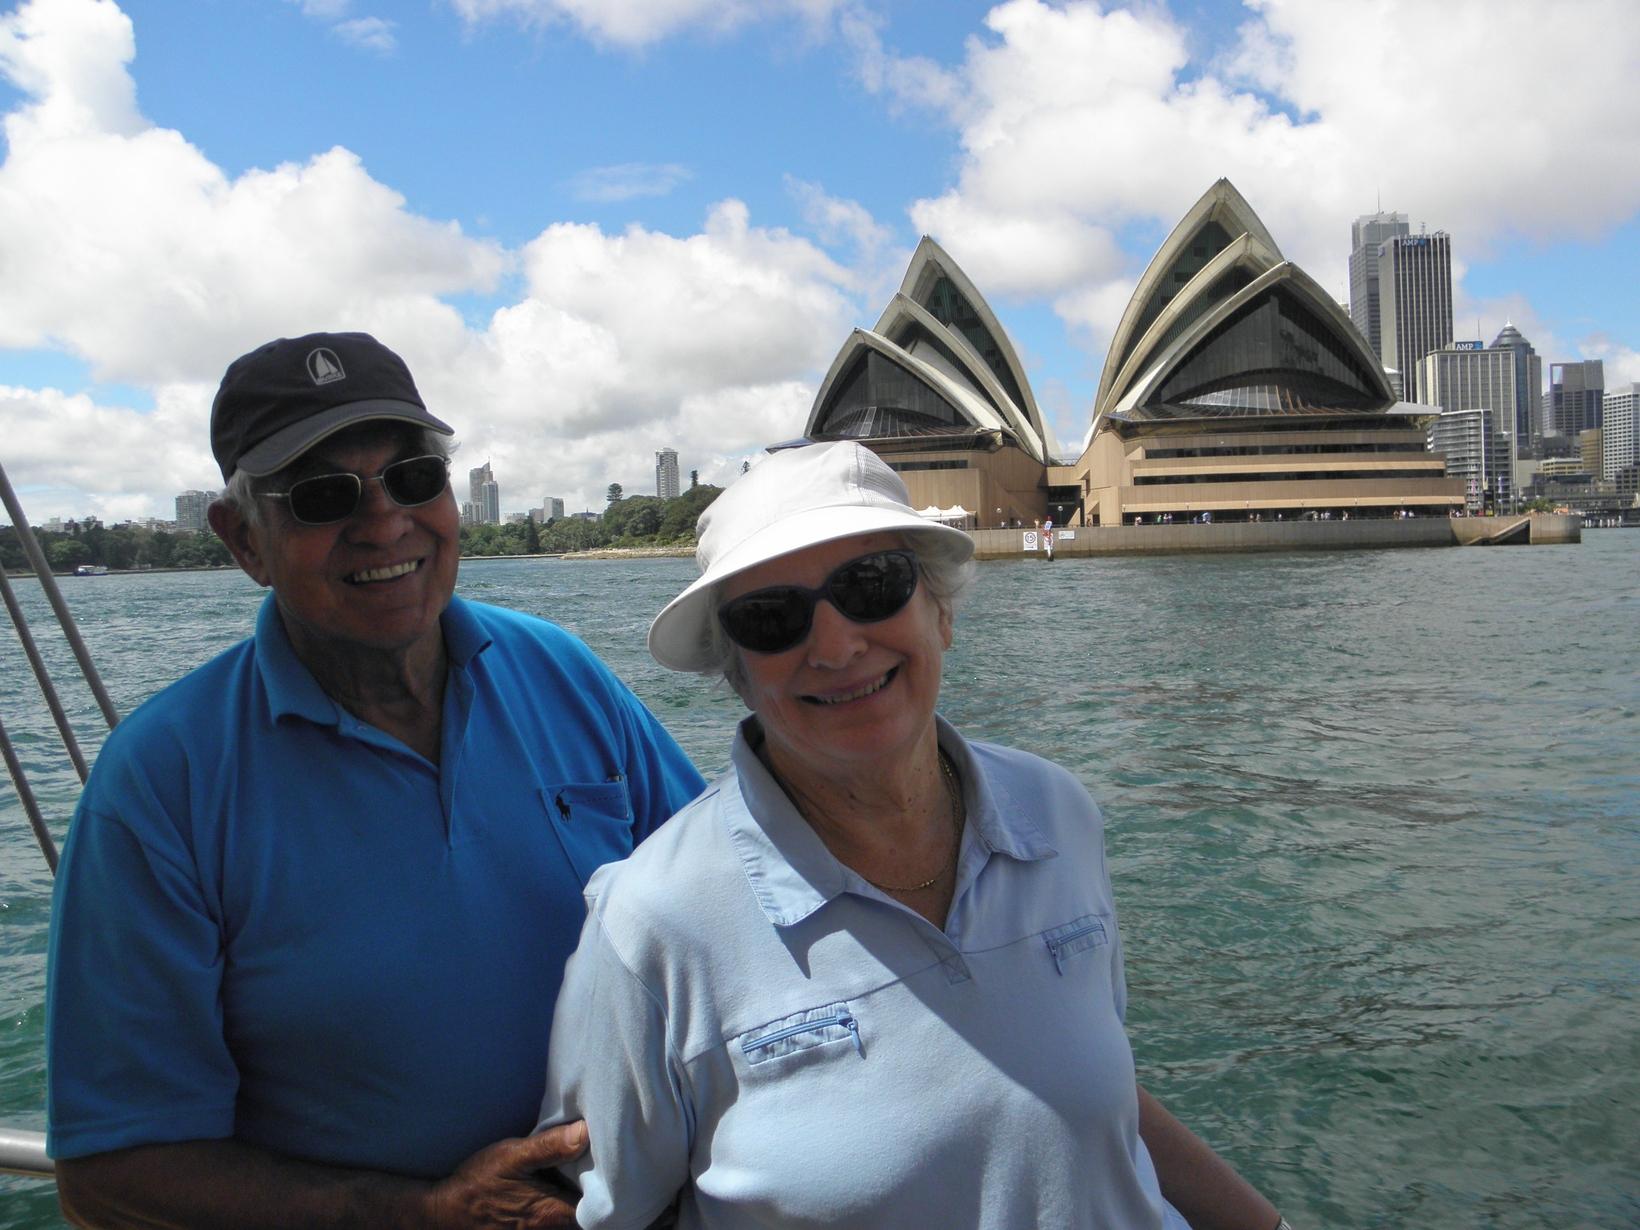 Helen & Ron from Toowoomba, Queensland, Australia